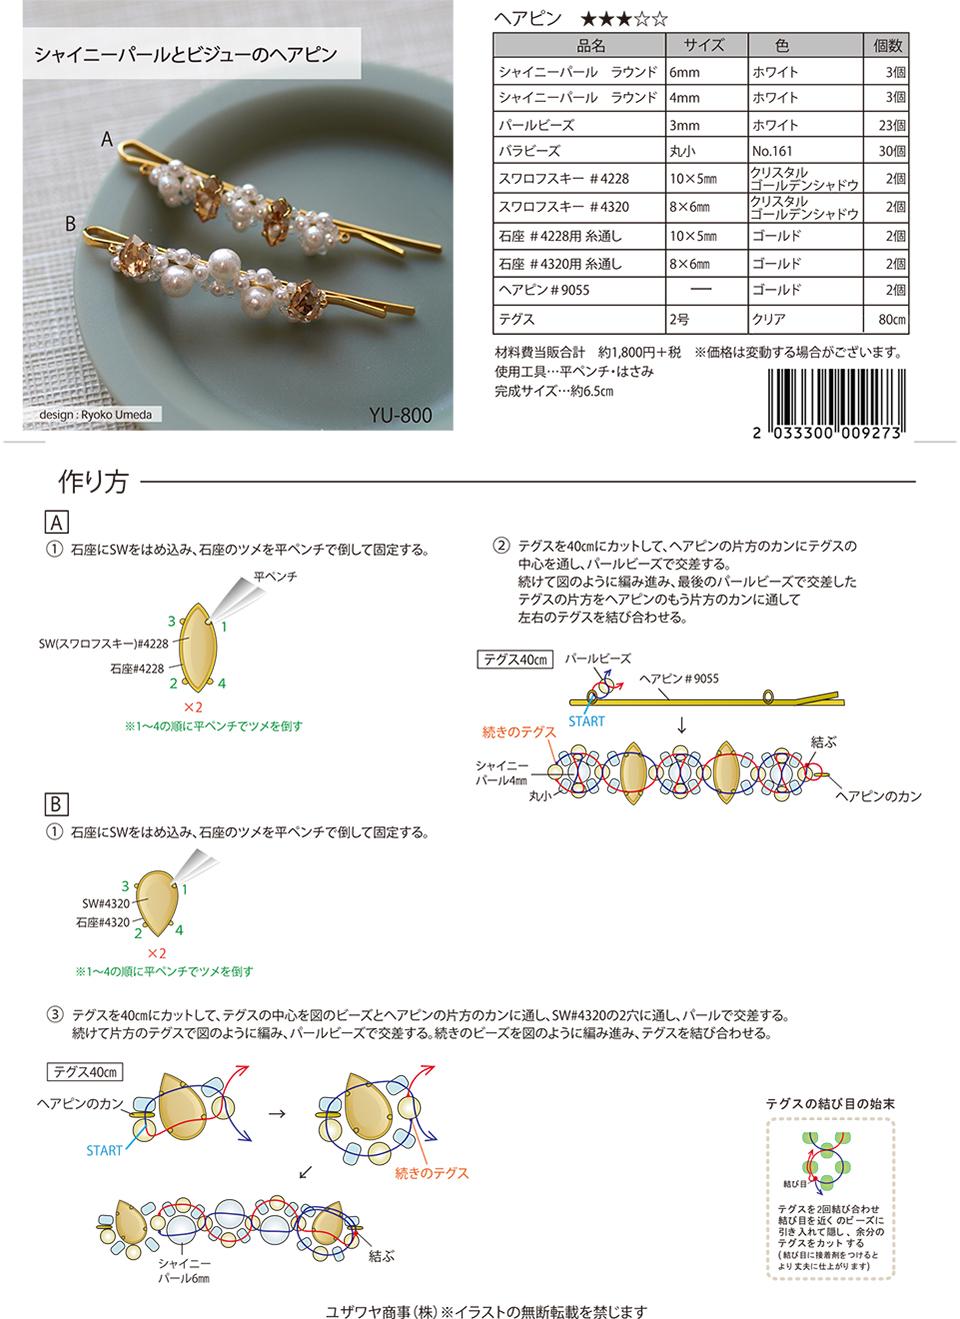 YU-800】シャイニーパールとビジューのヘアピン_1.jpg